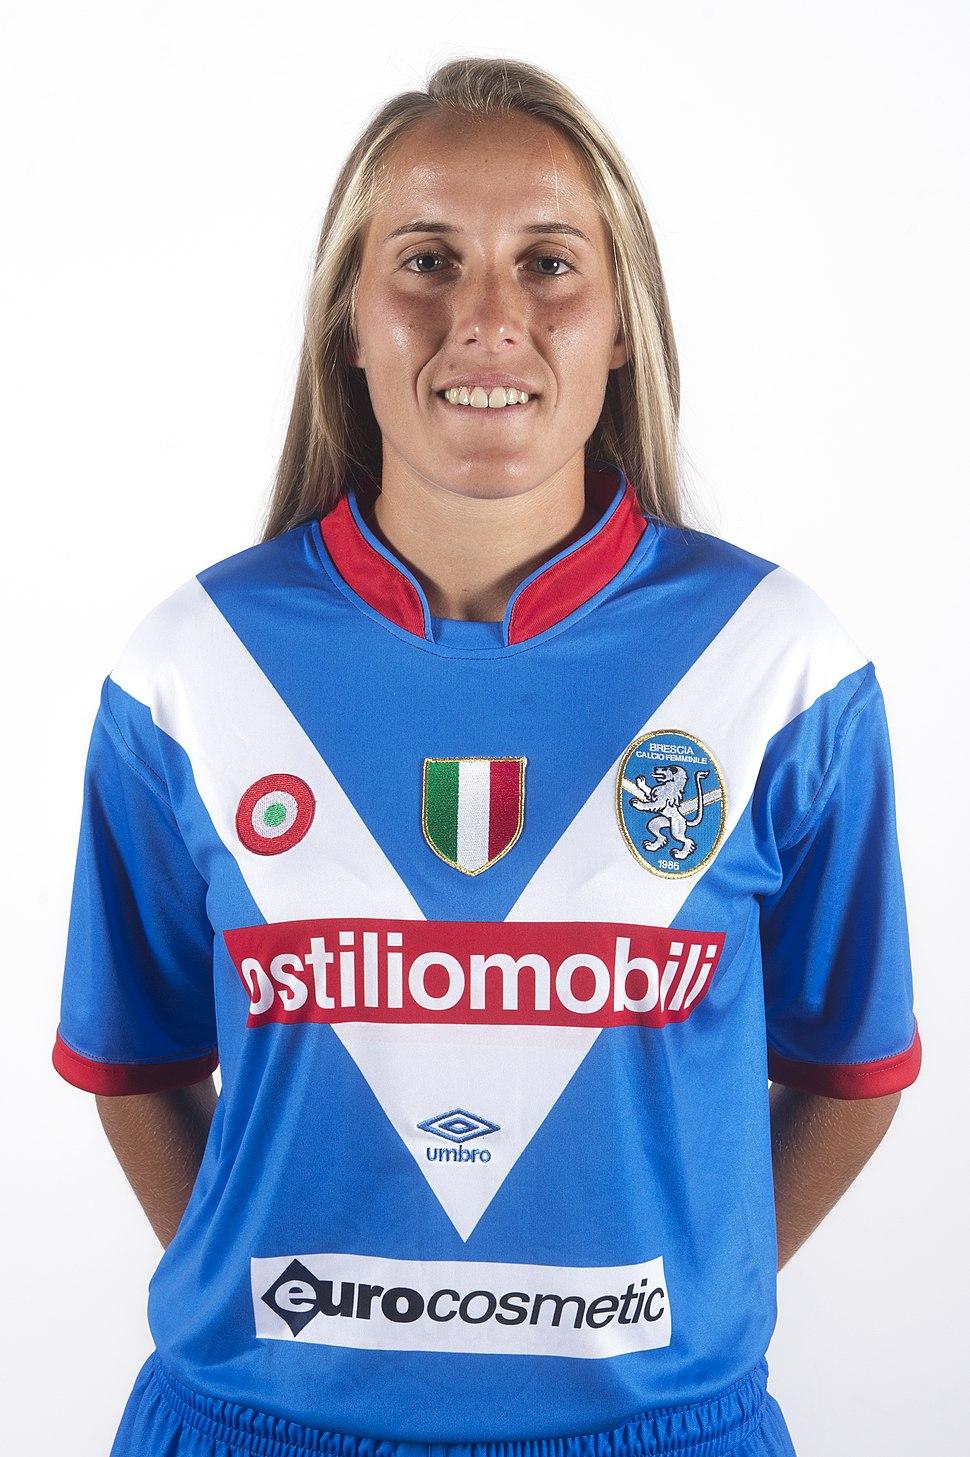 Valentina Cernoia, MF Brescia Calcio Femminile 08 2016